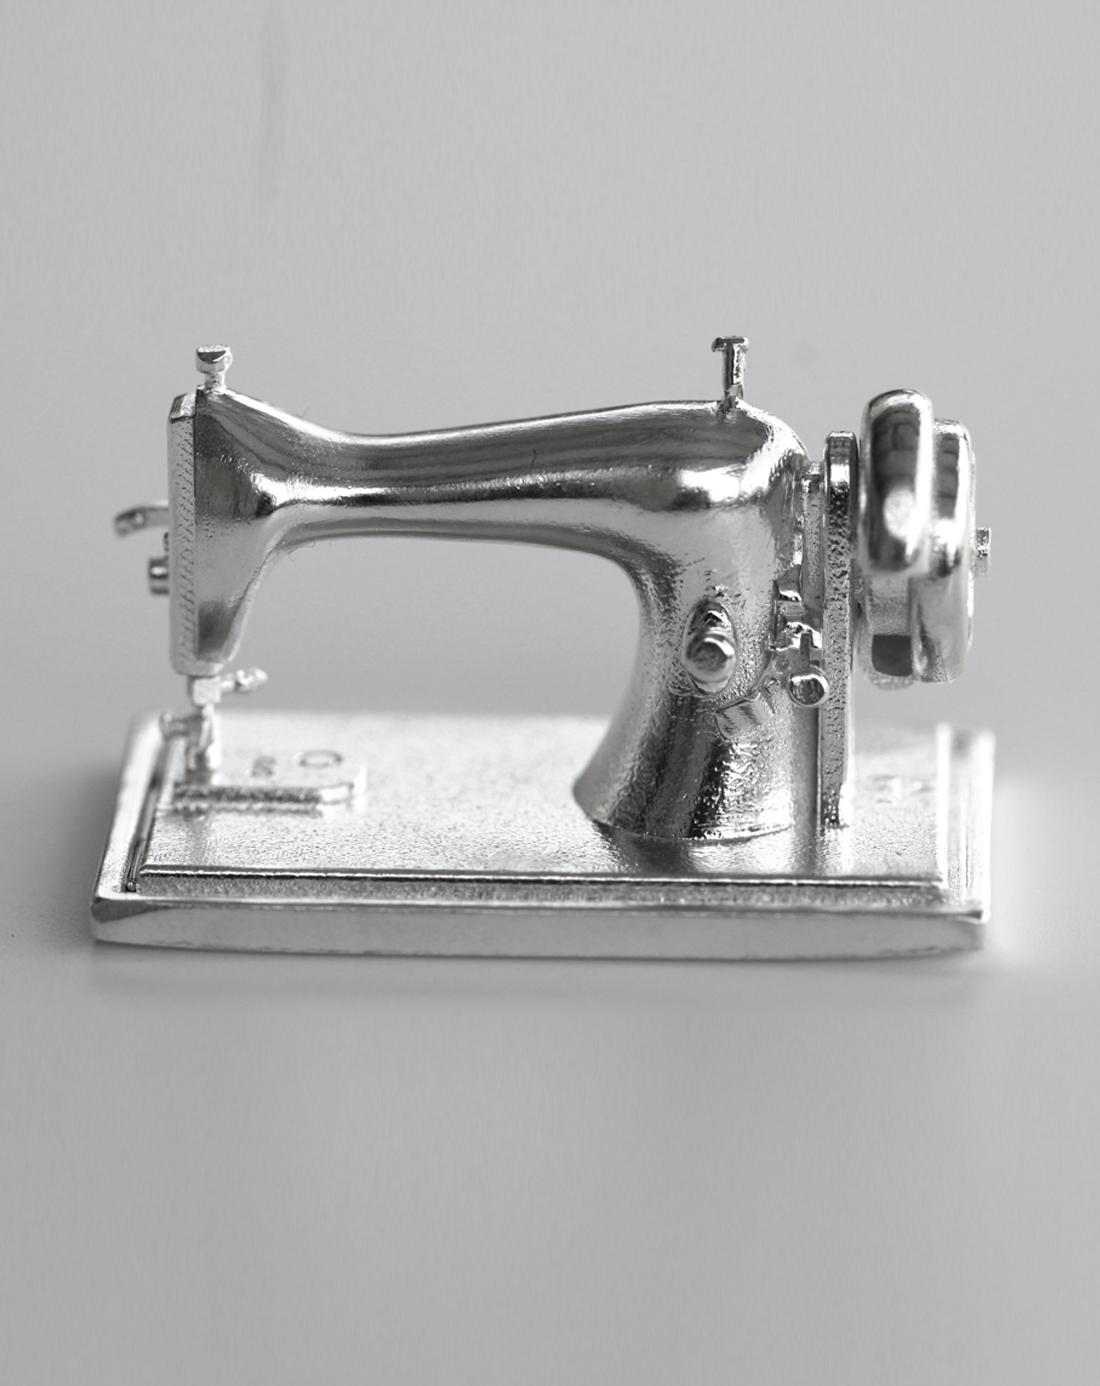 sewing machine 3d art